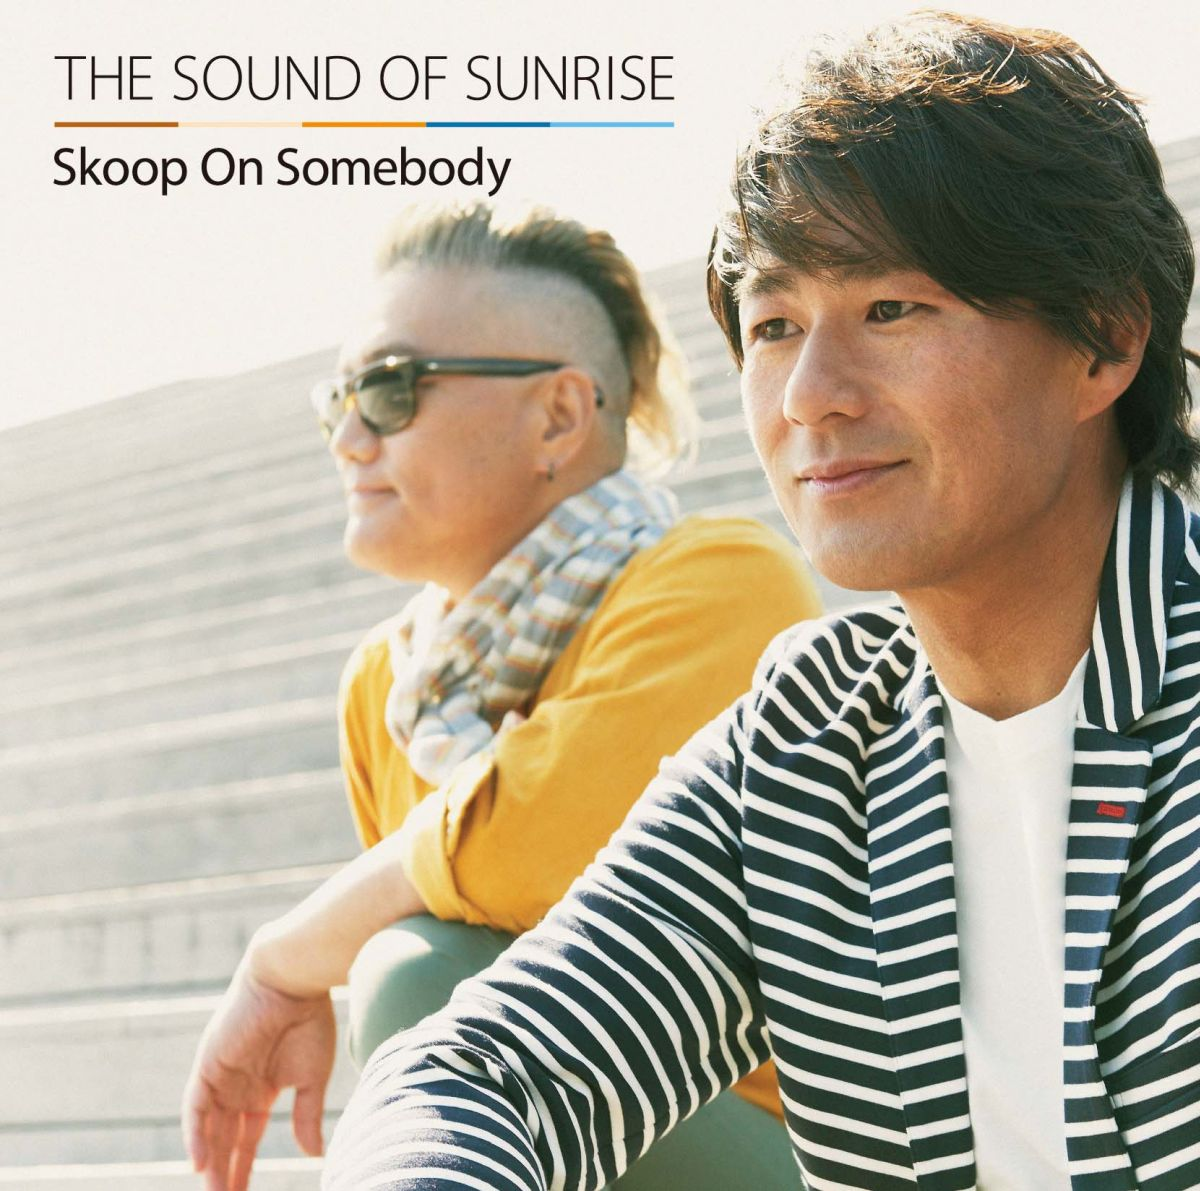 THE SOUND OF SUNRISE [ Skoop On Somebody ]